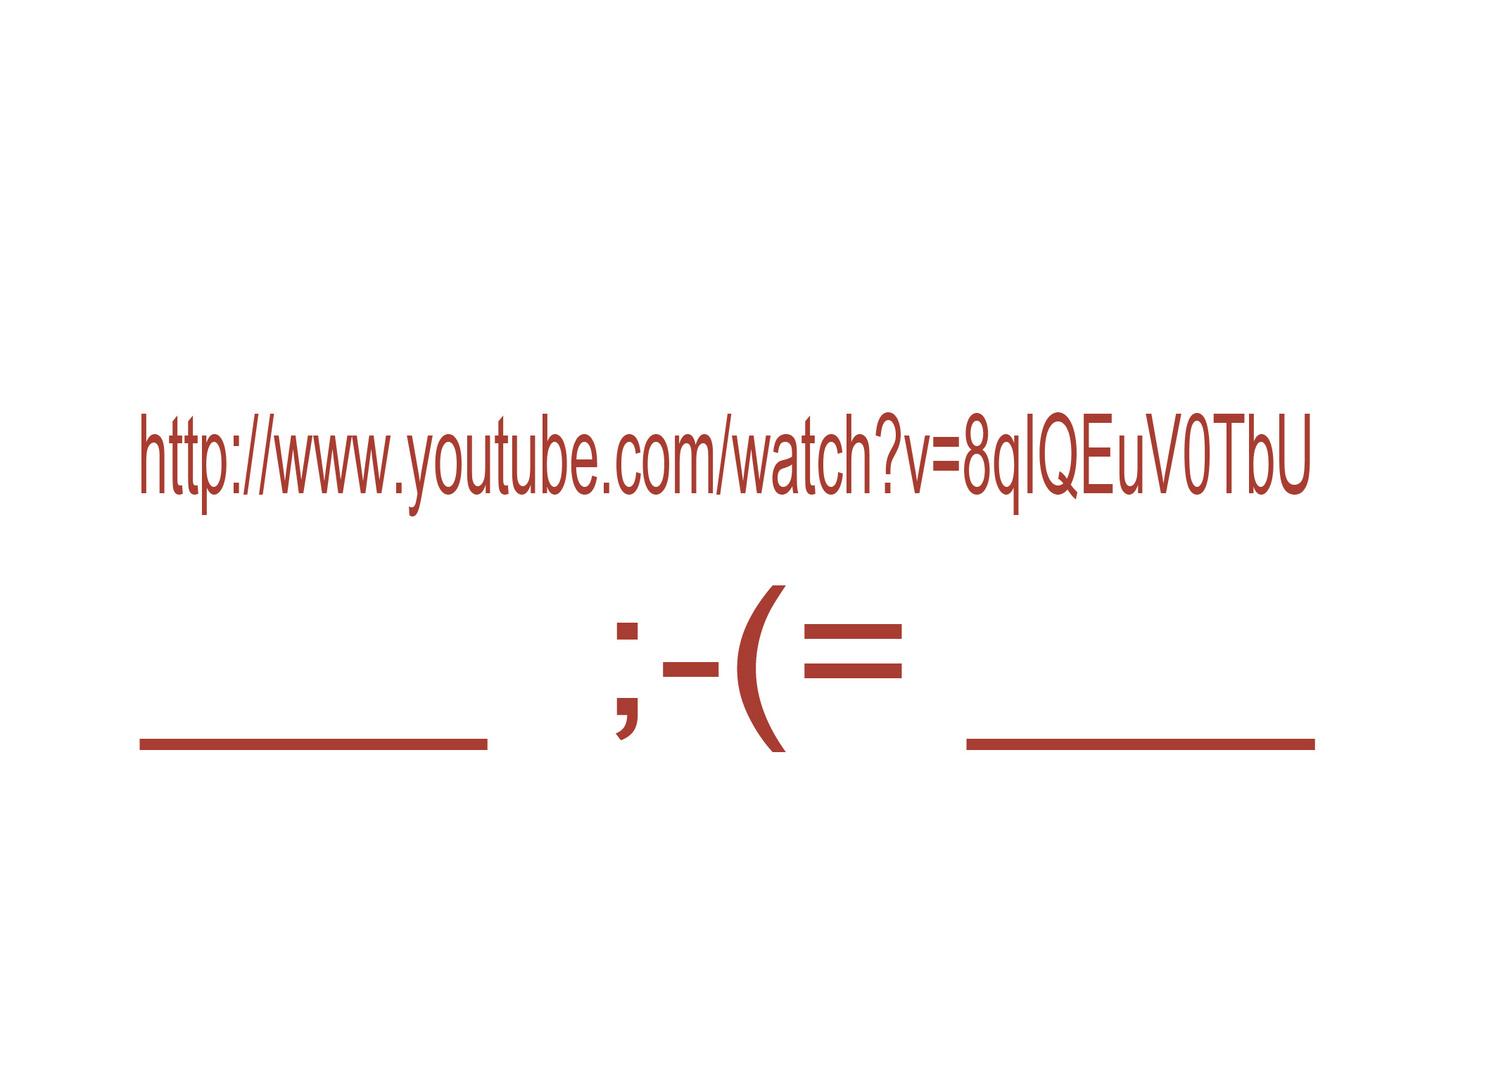 *Youtube*